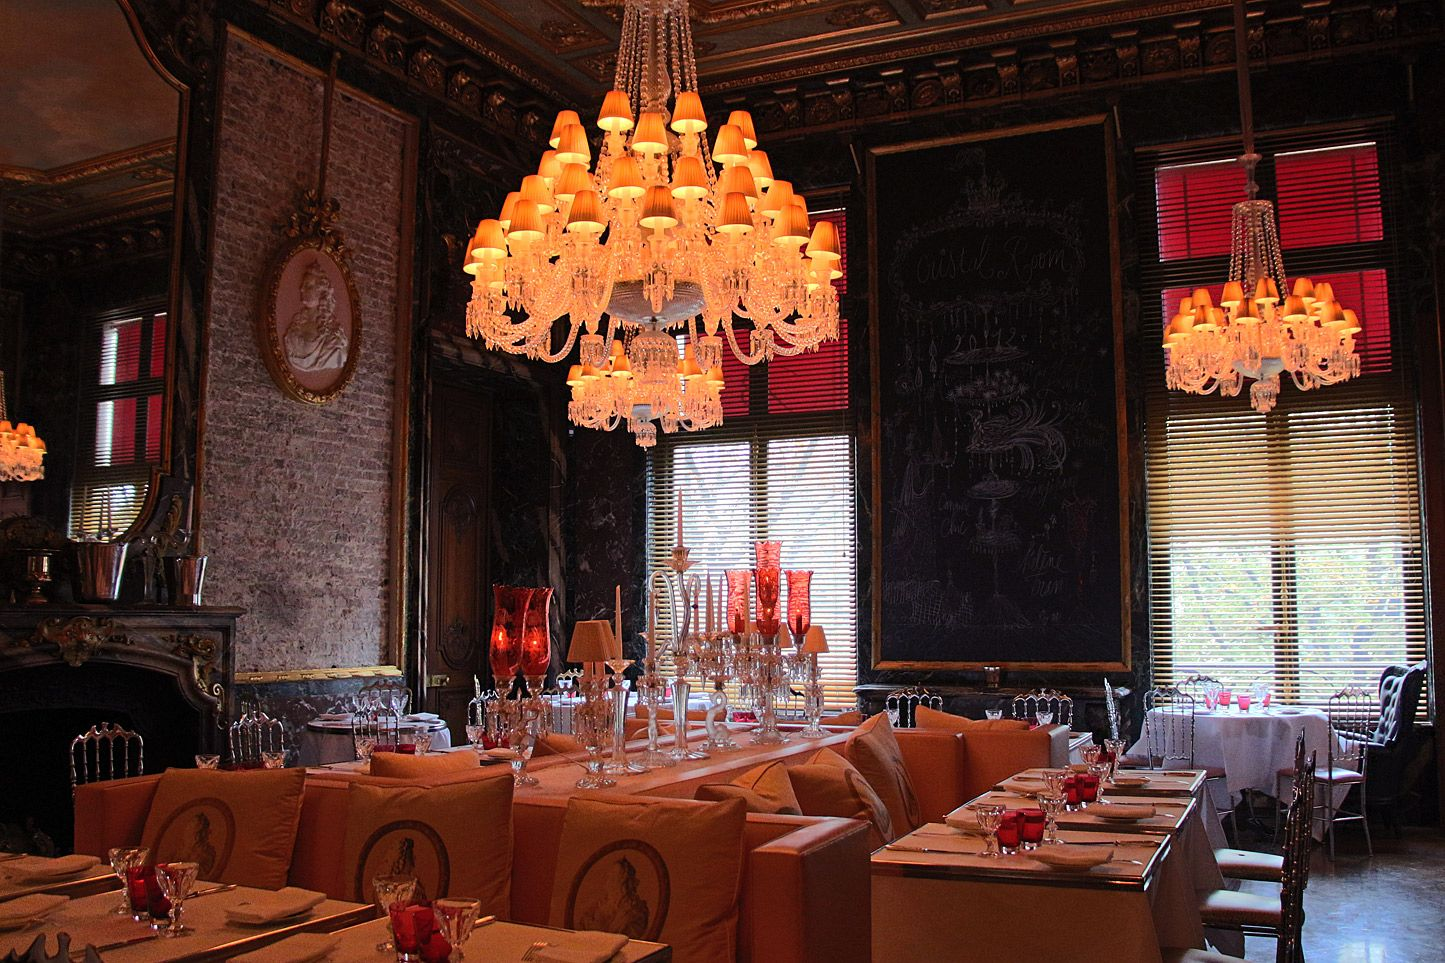 Restaurant Cristal Room Guy Martin A Paris 16 Paris Luxury Paris Restaurants Springtime In Paris